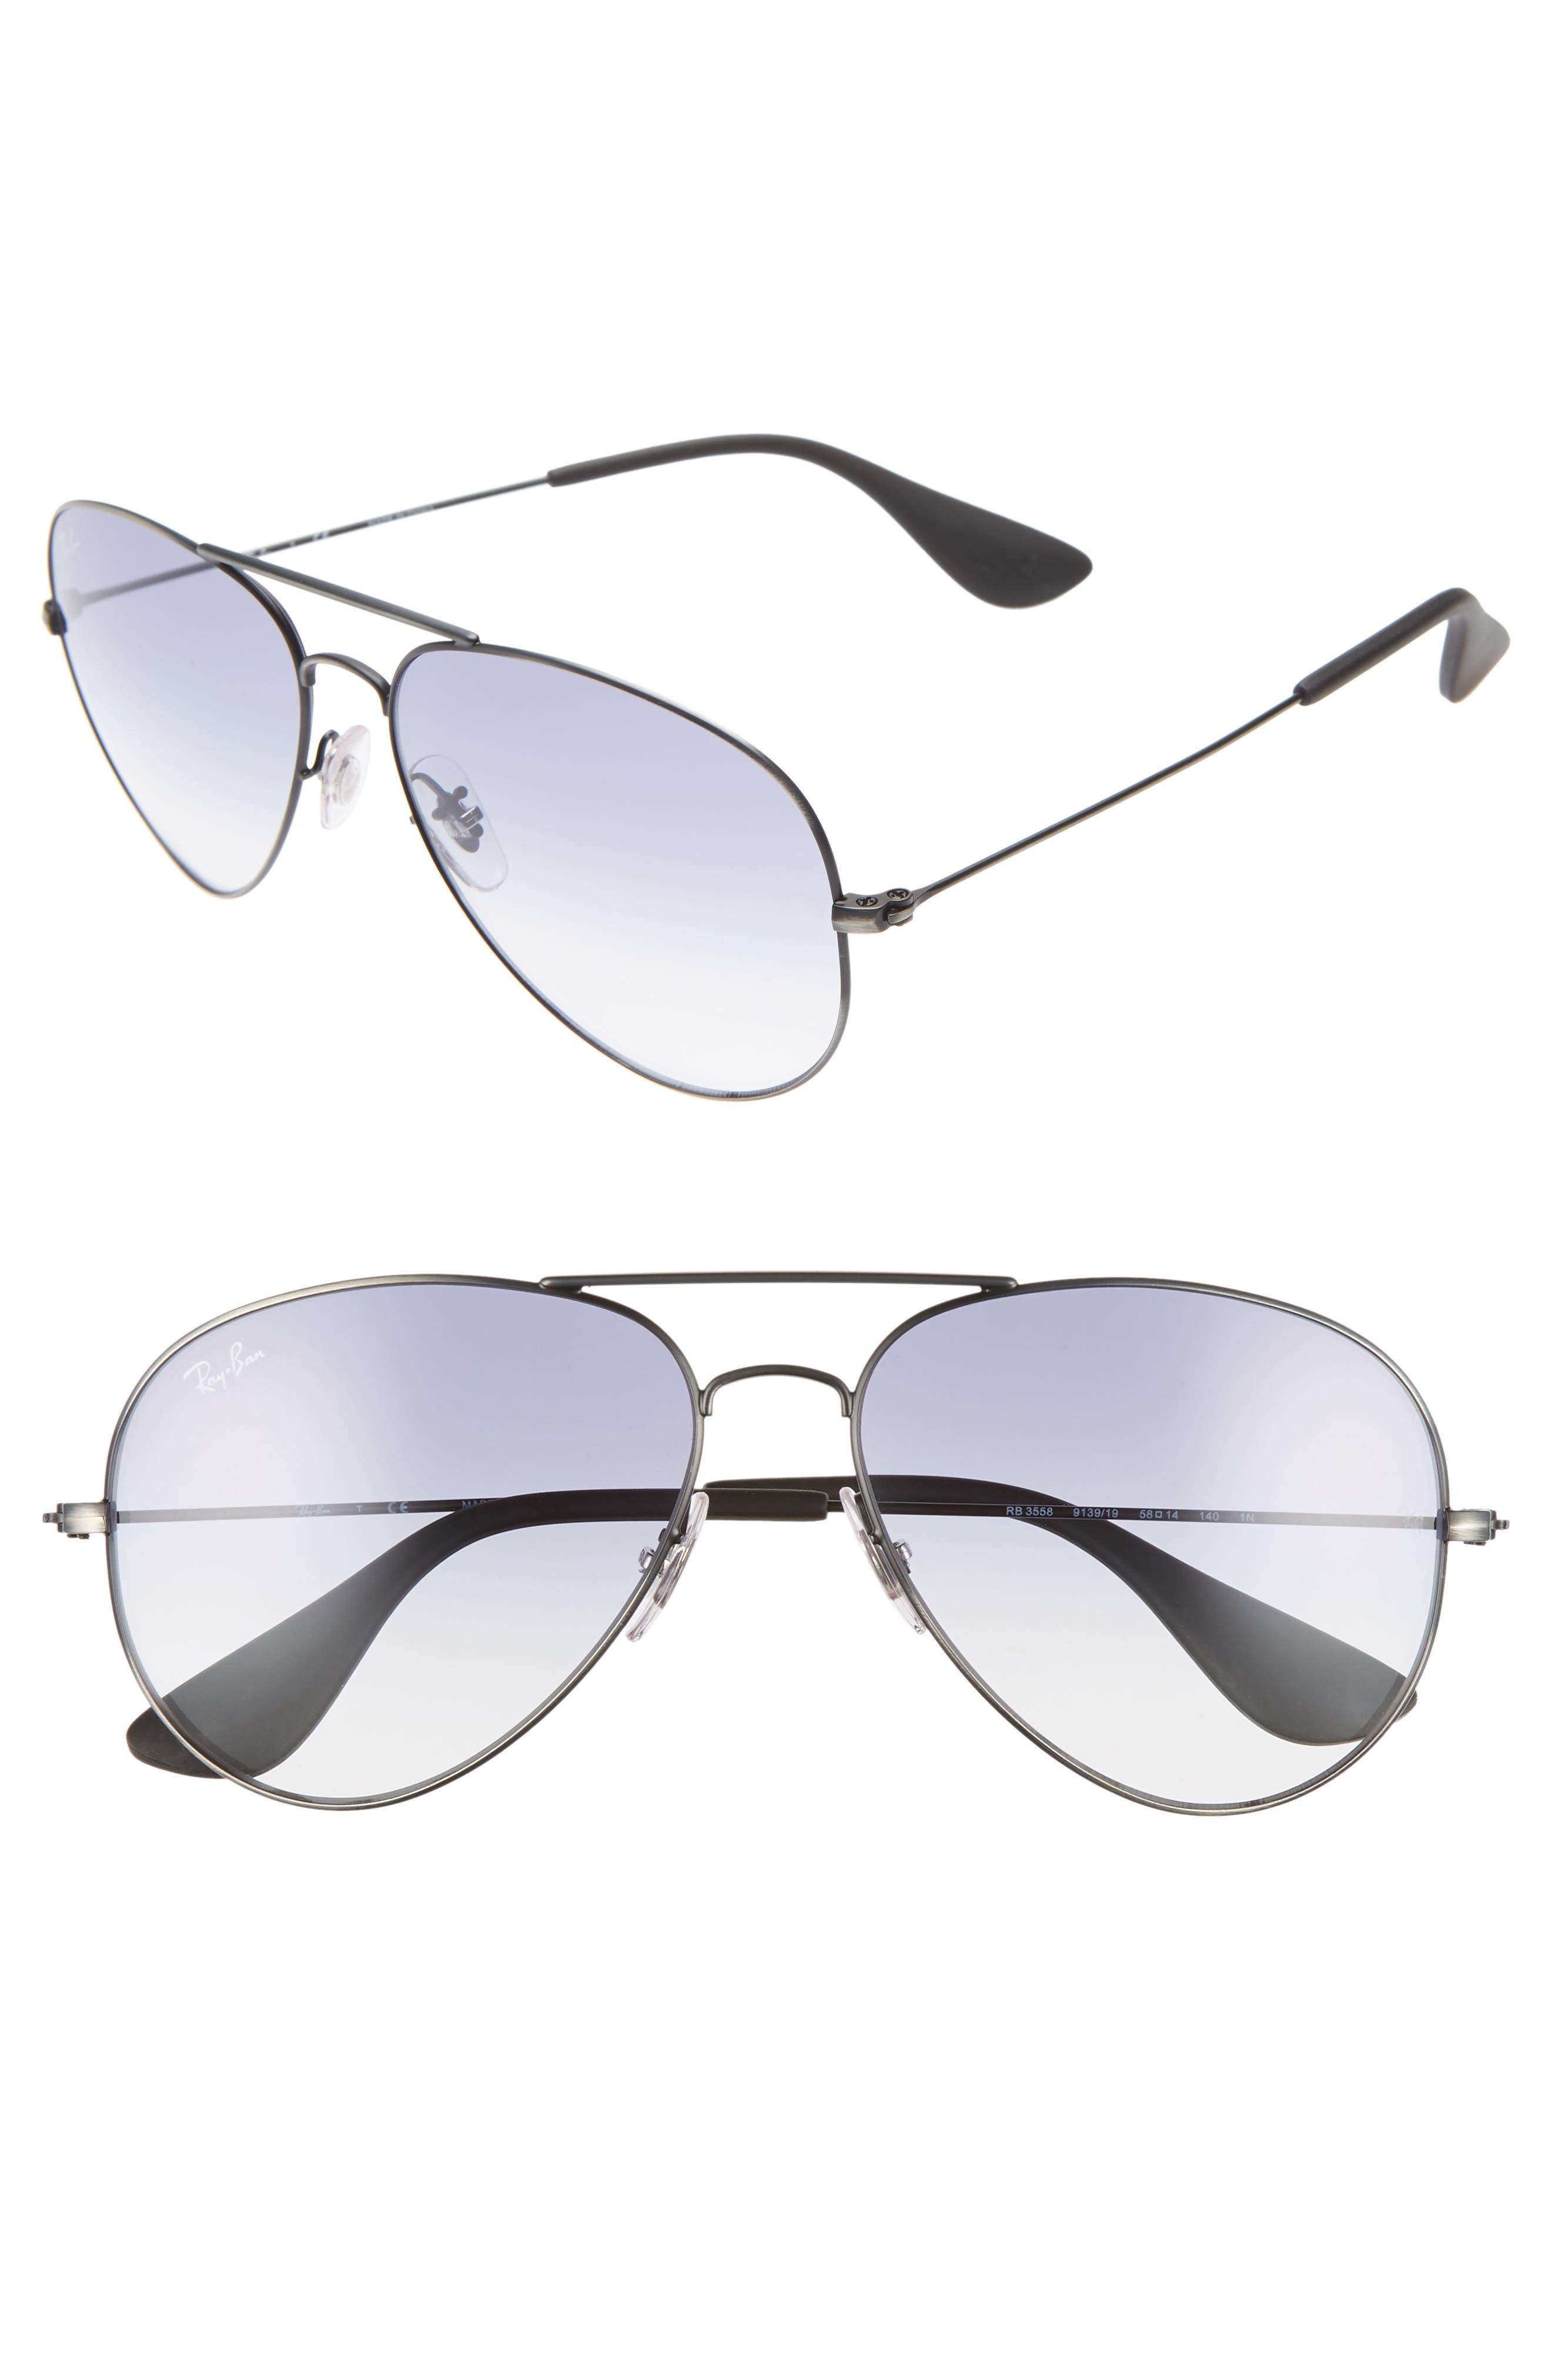 Ray-Ban 5m Gradient Aviator Sunglasses - Silver/ Light Blue Gradient